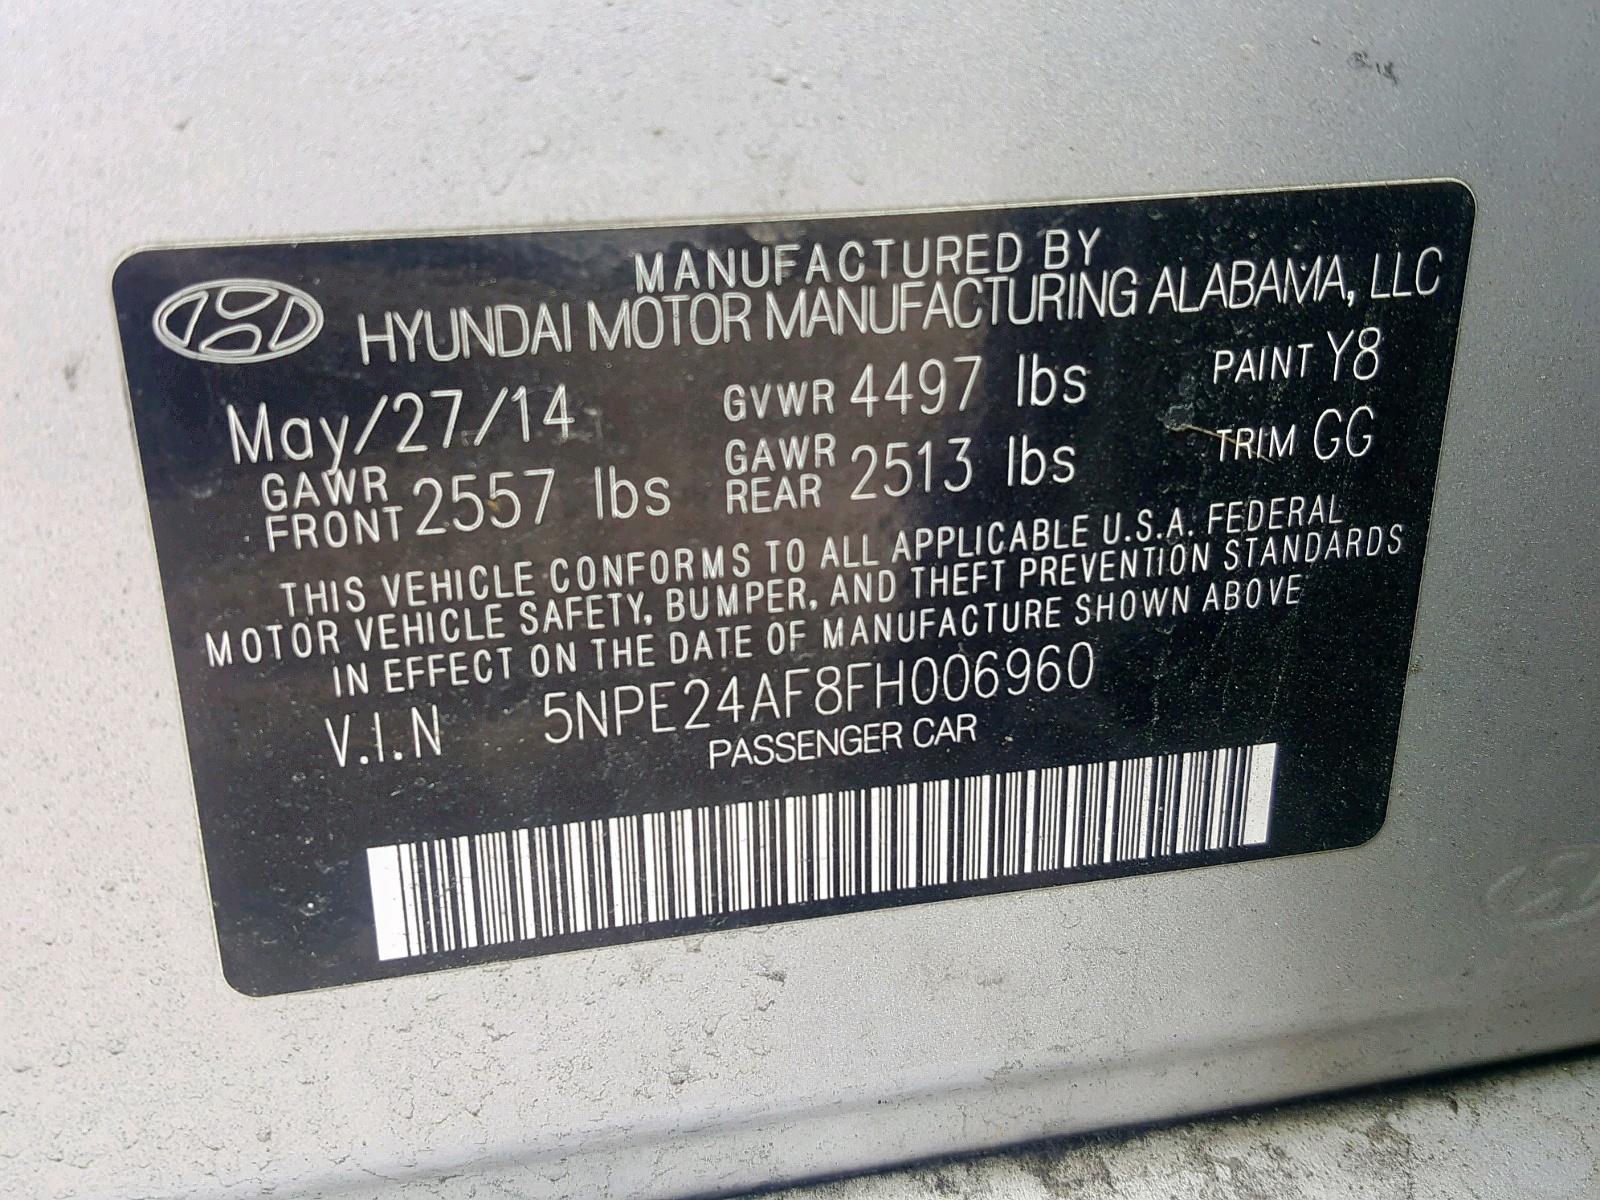 5NPE24AF8FH006960 - 2015 Hyundai Sonata Se 2.4L